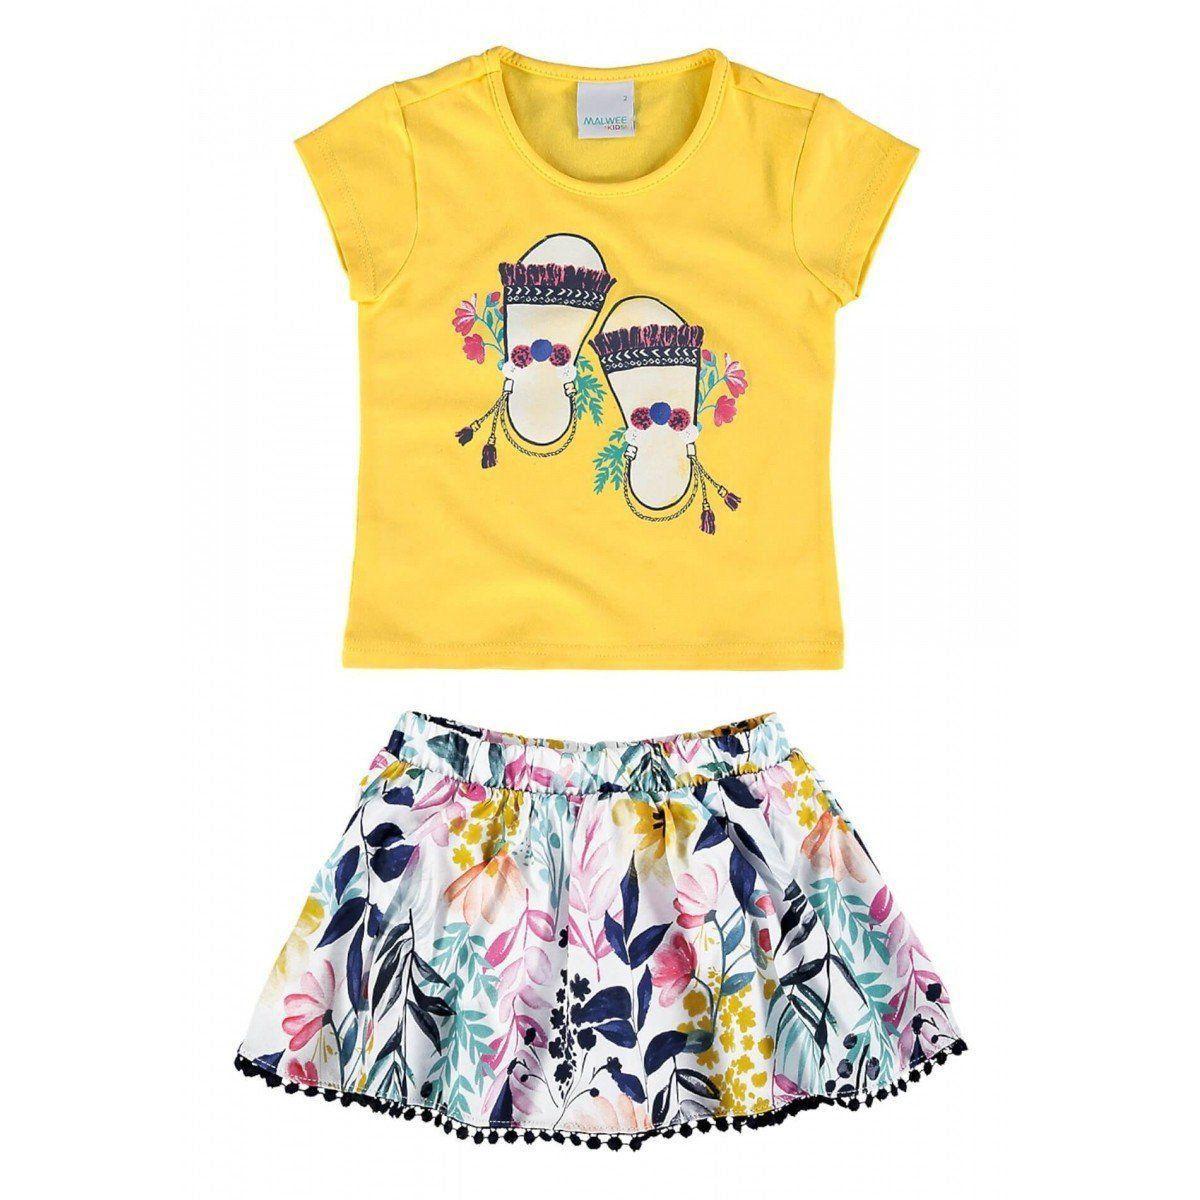 Conjunto Infantil Feminino Amarelo Sandálias Malwee